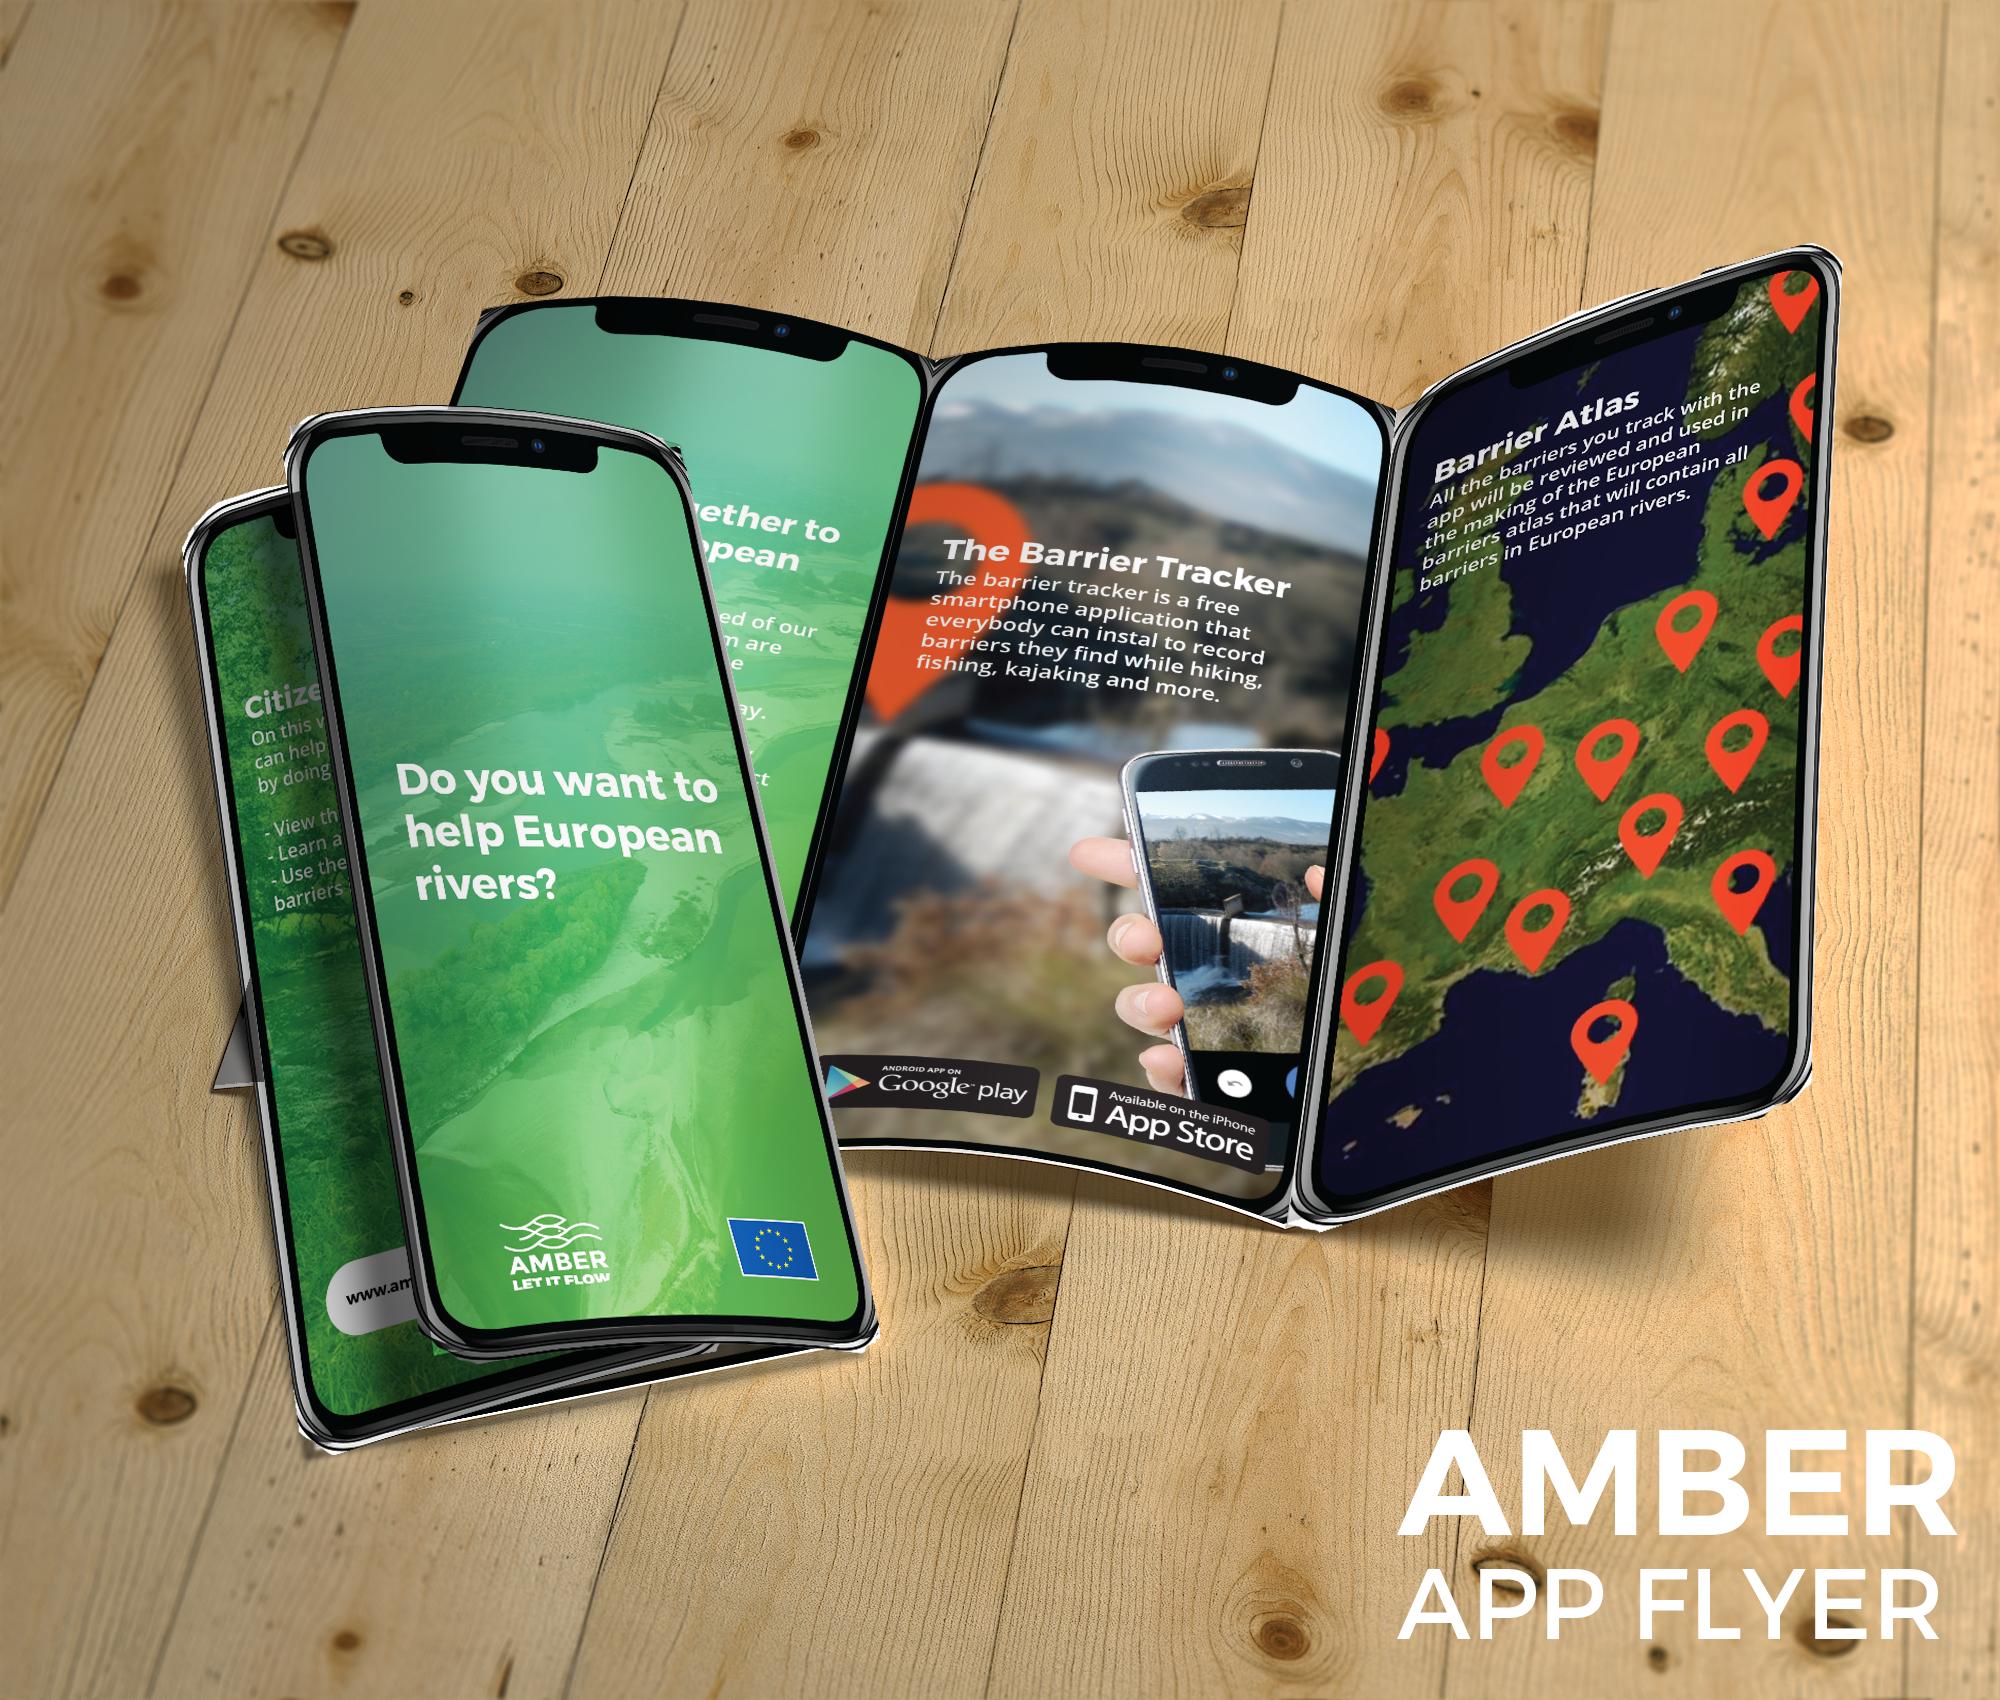 AMBER-APP-FLYER-mockup